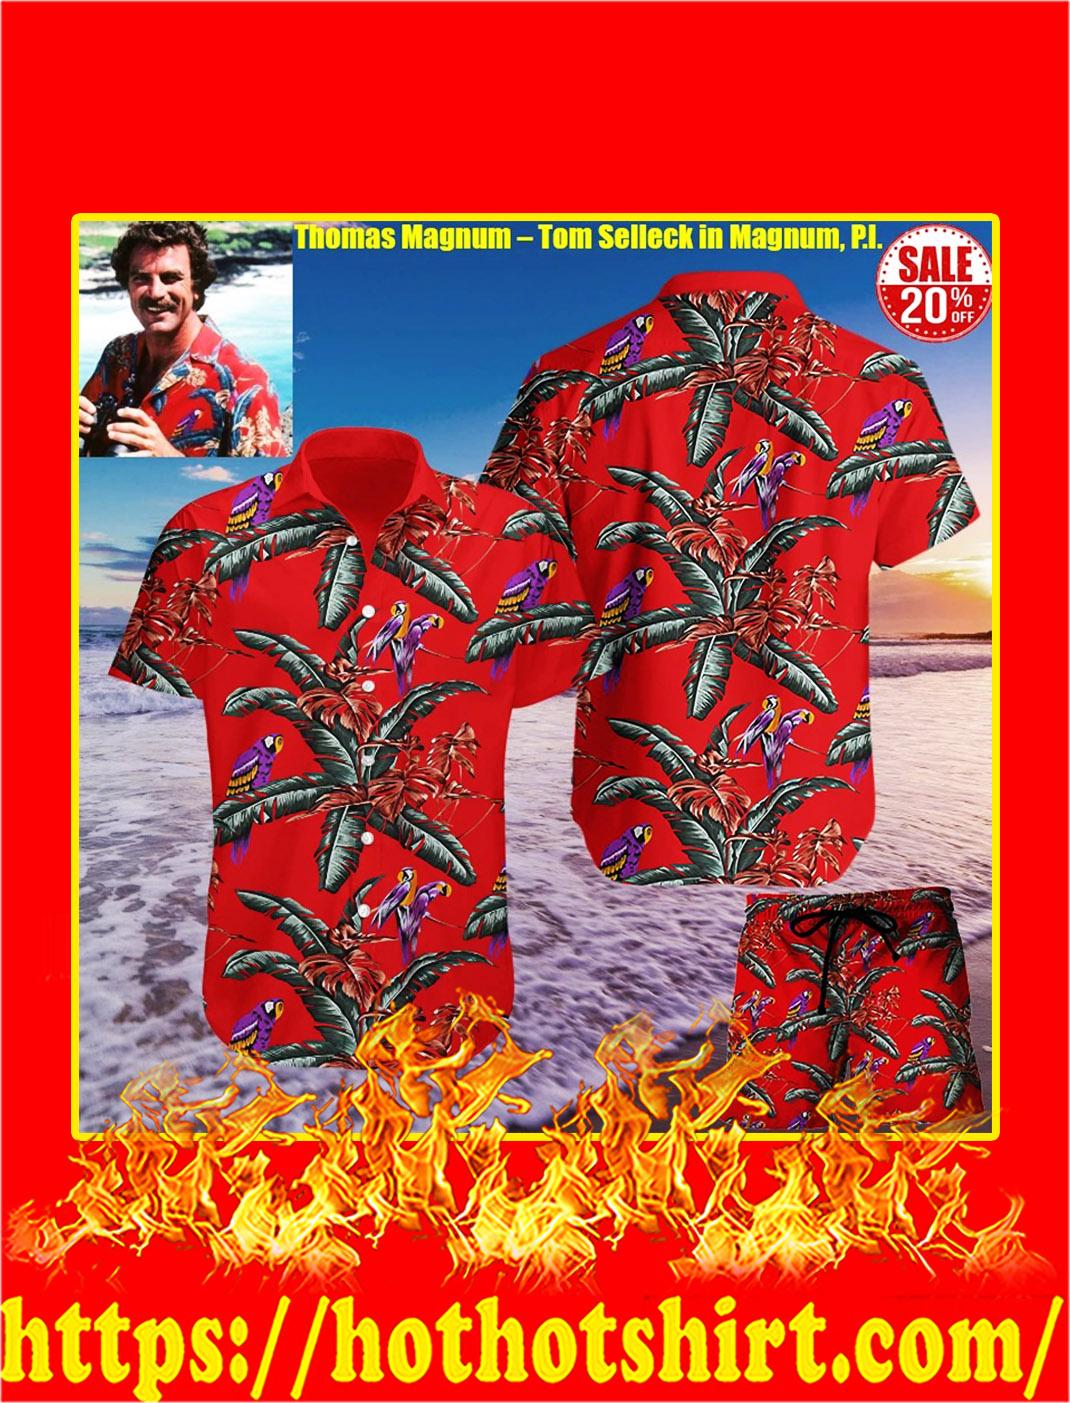 Tom Selleck in Magnum hawaiian shirt - pic 1